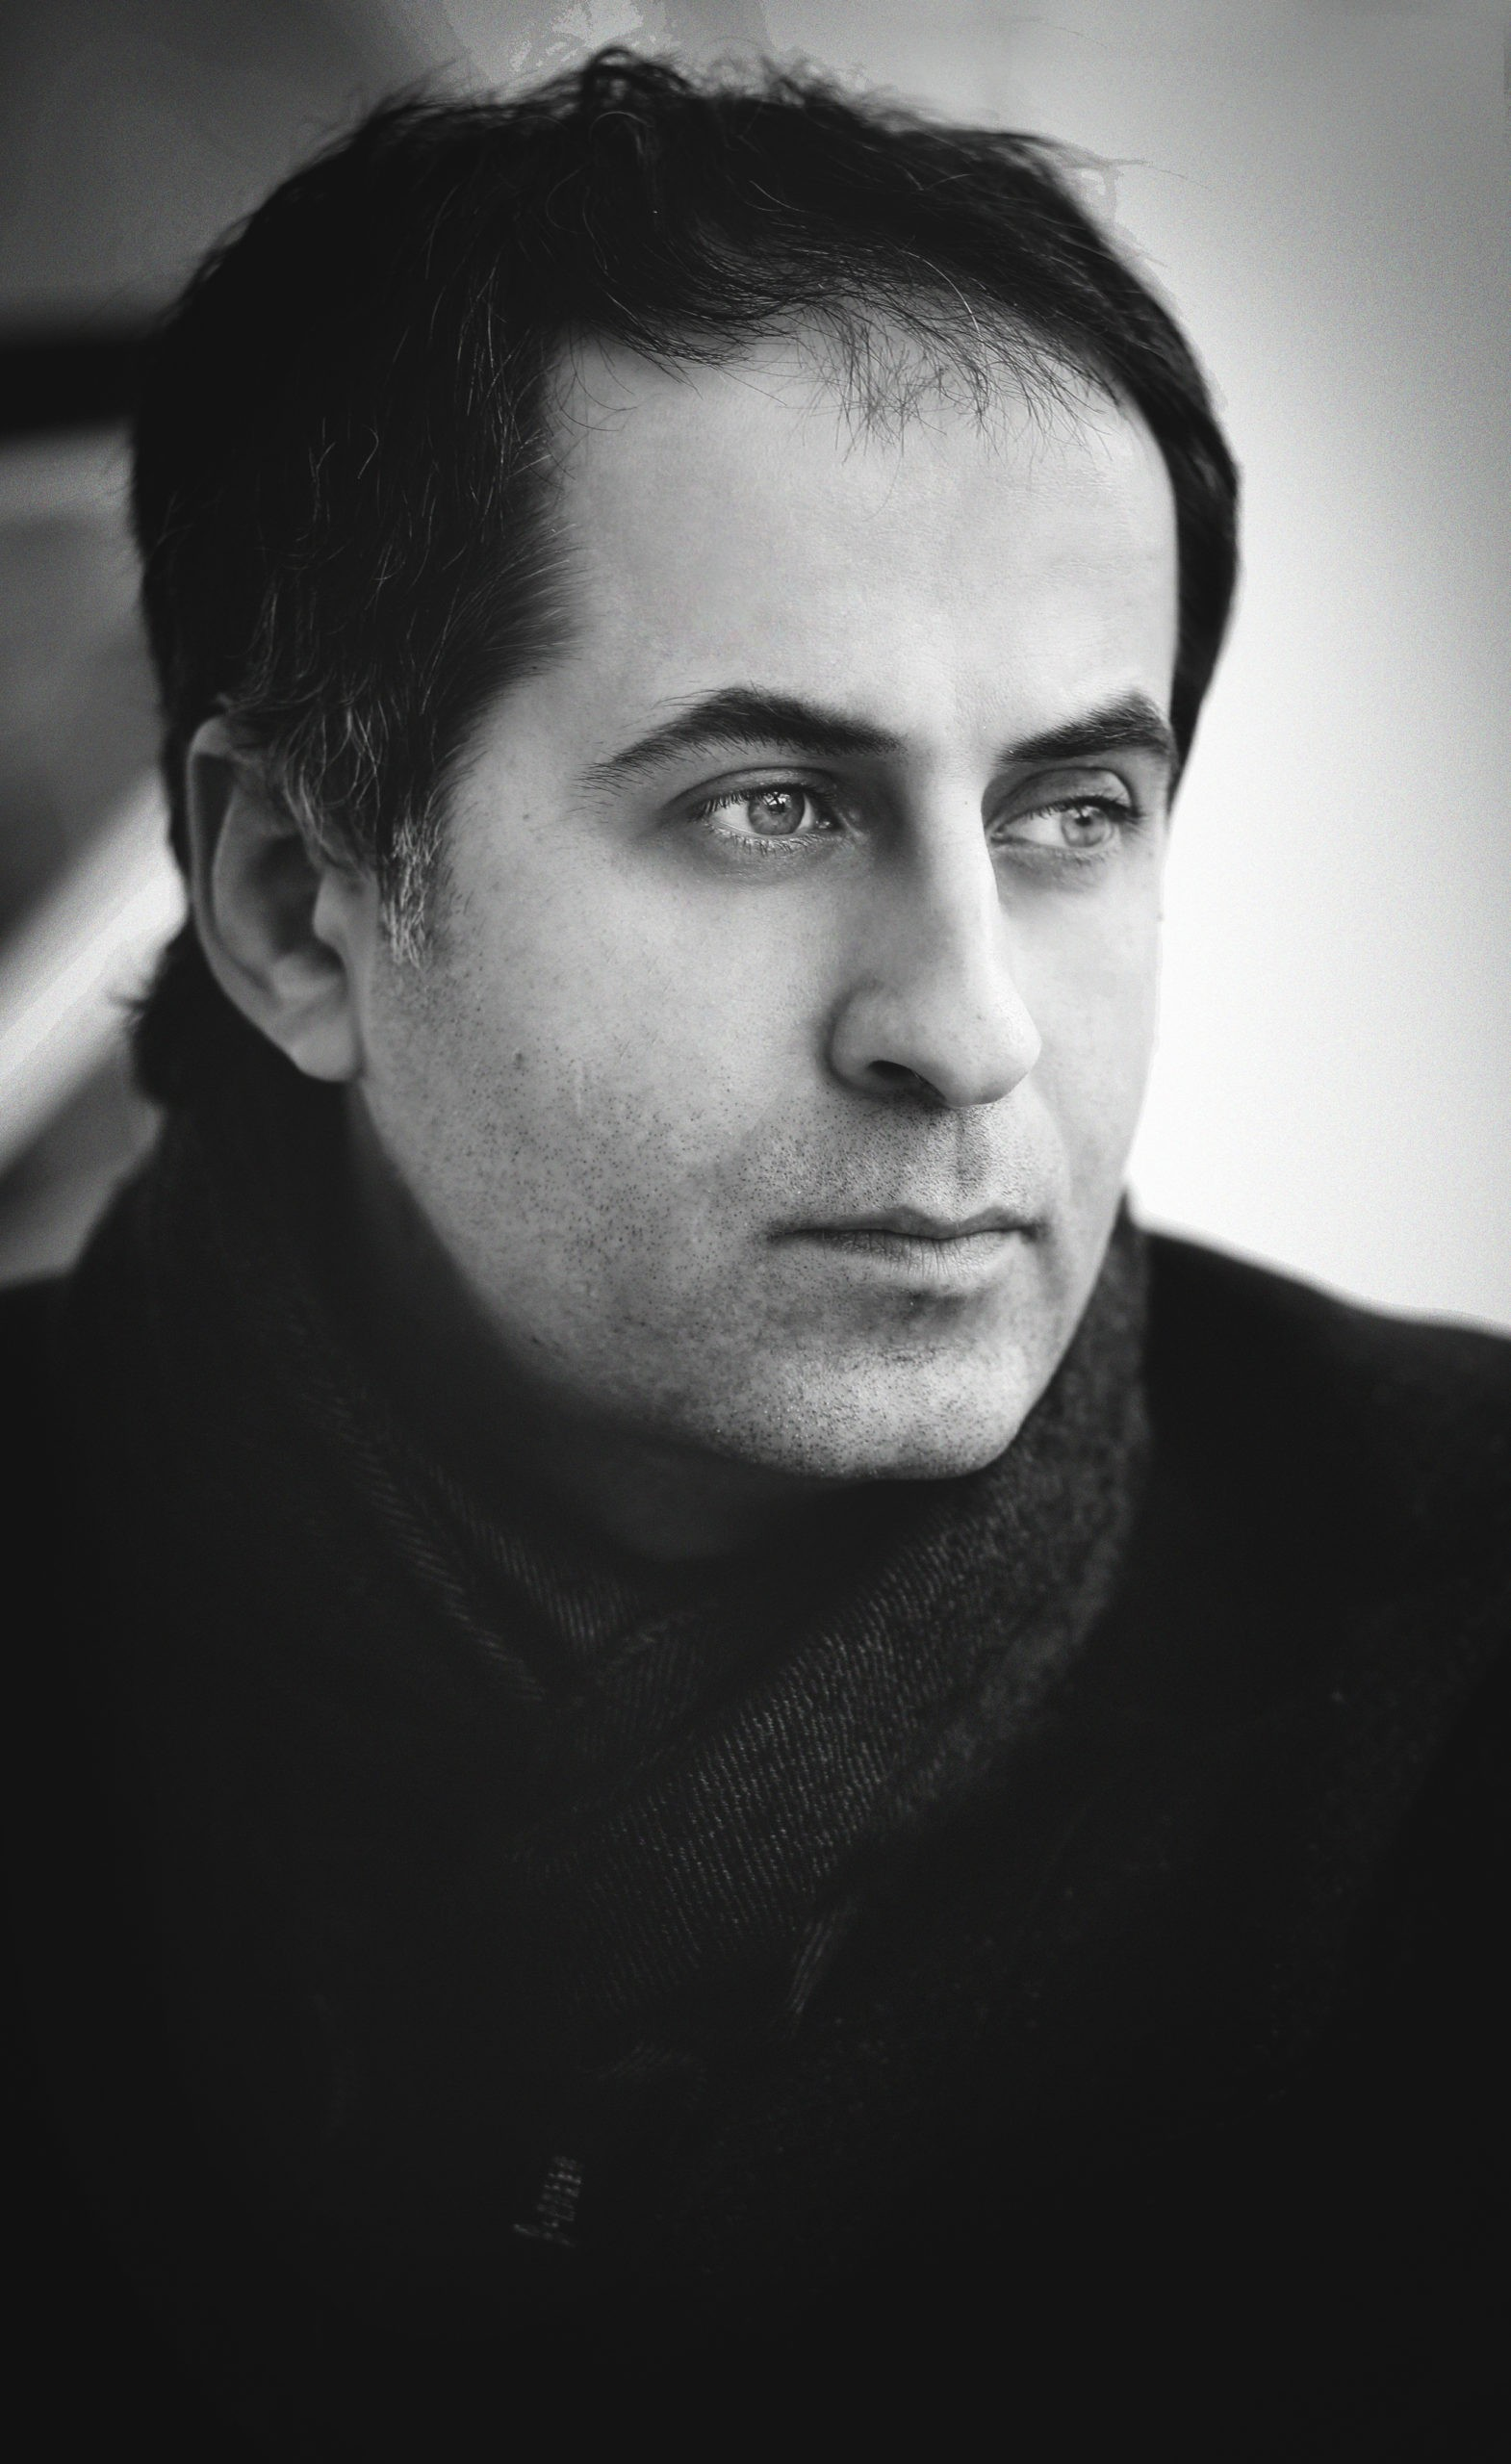 Ruslan Lobanov